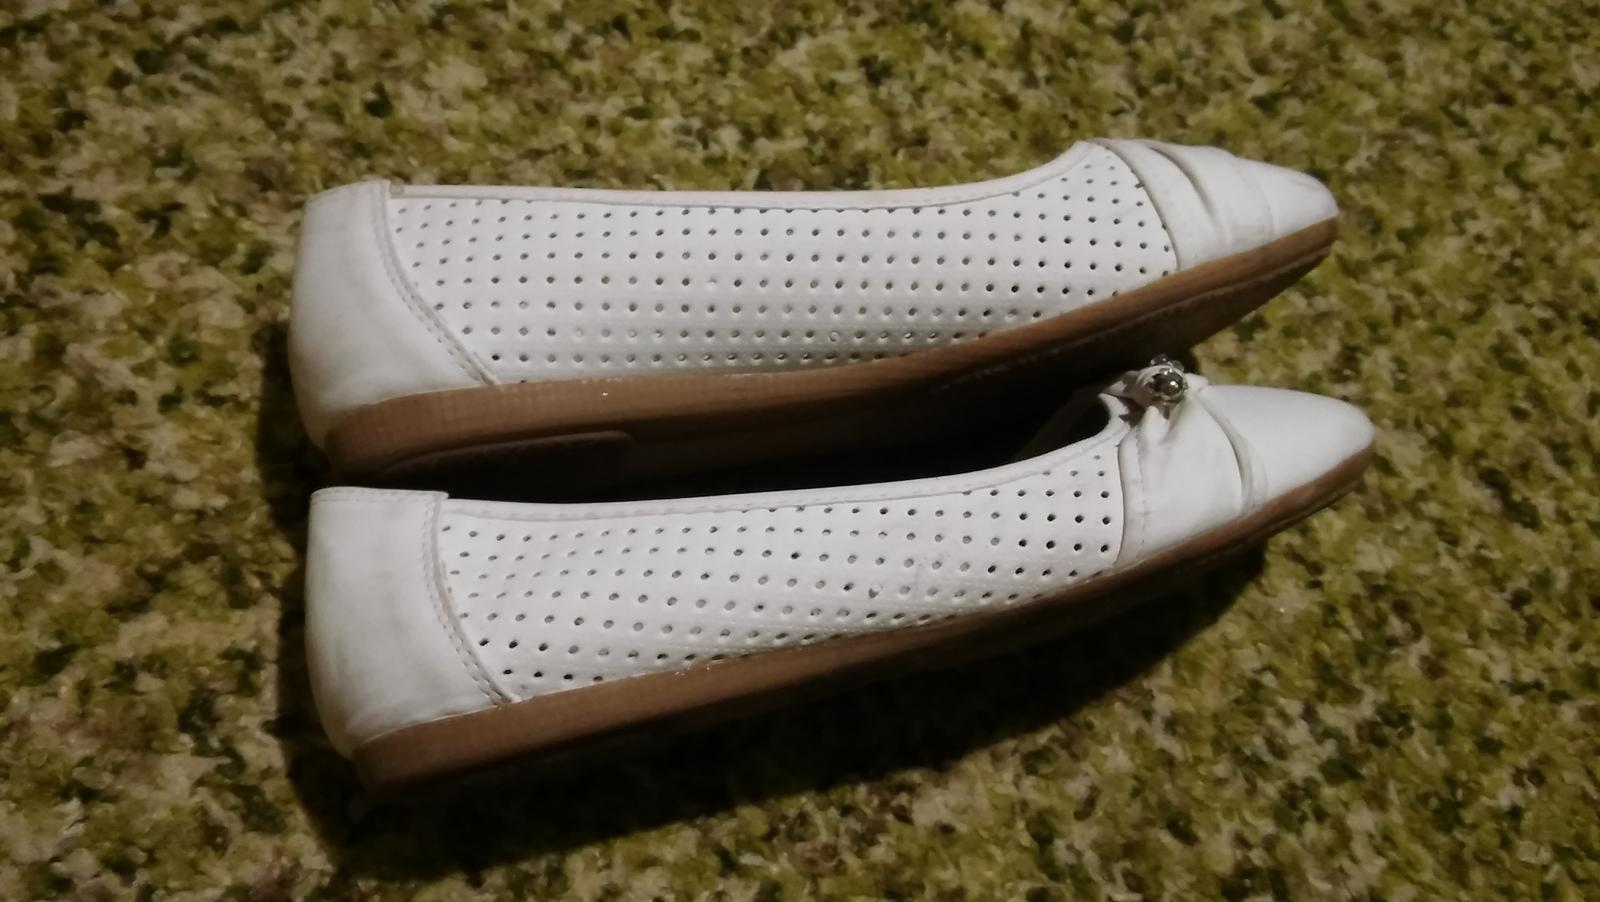 biele baleriny - Obrázok č. 2